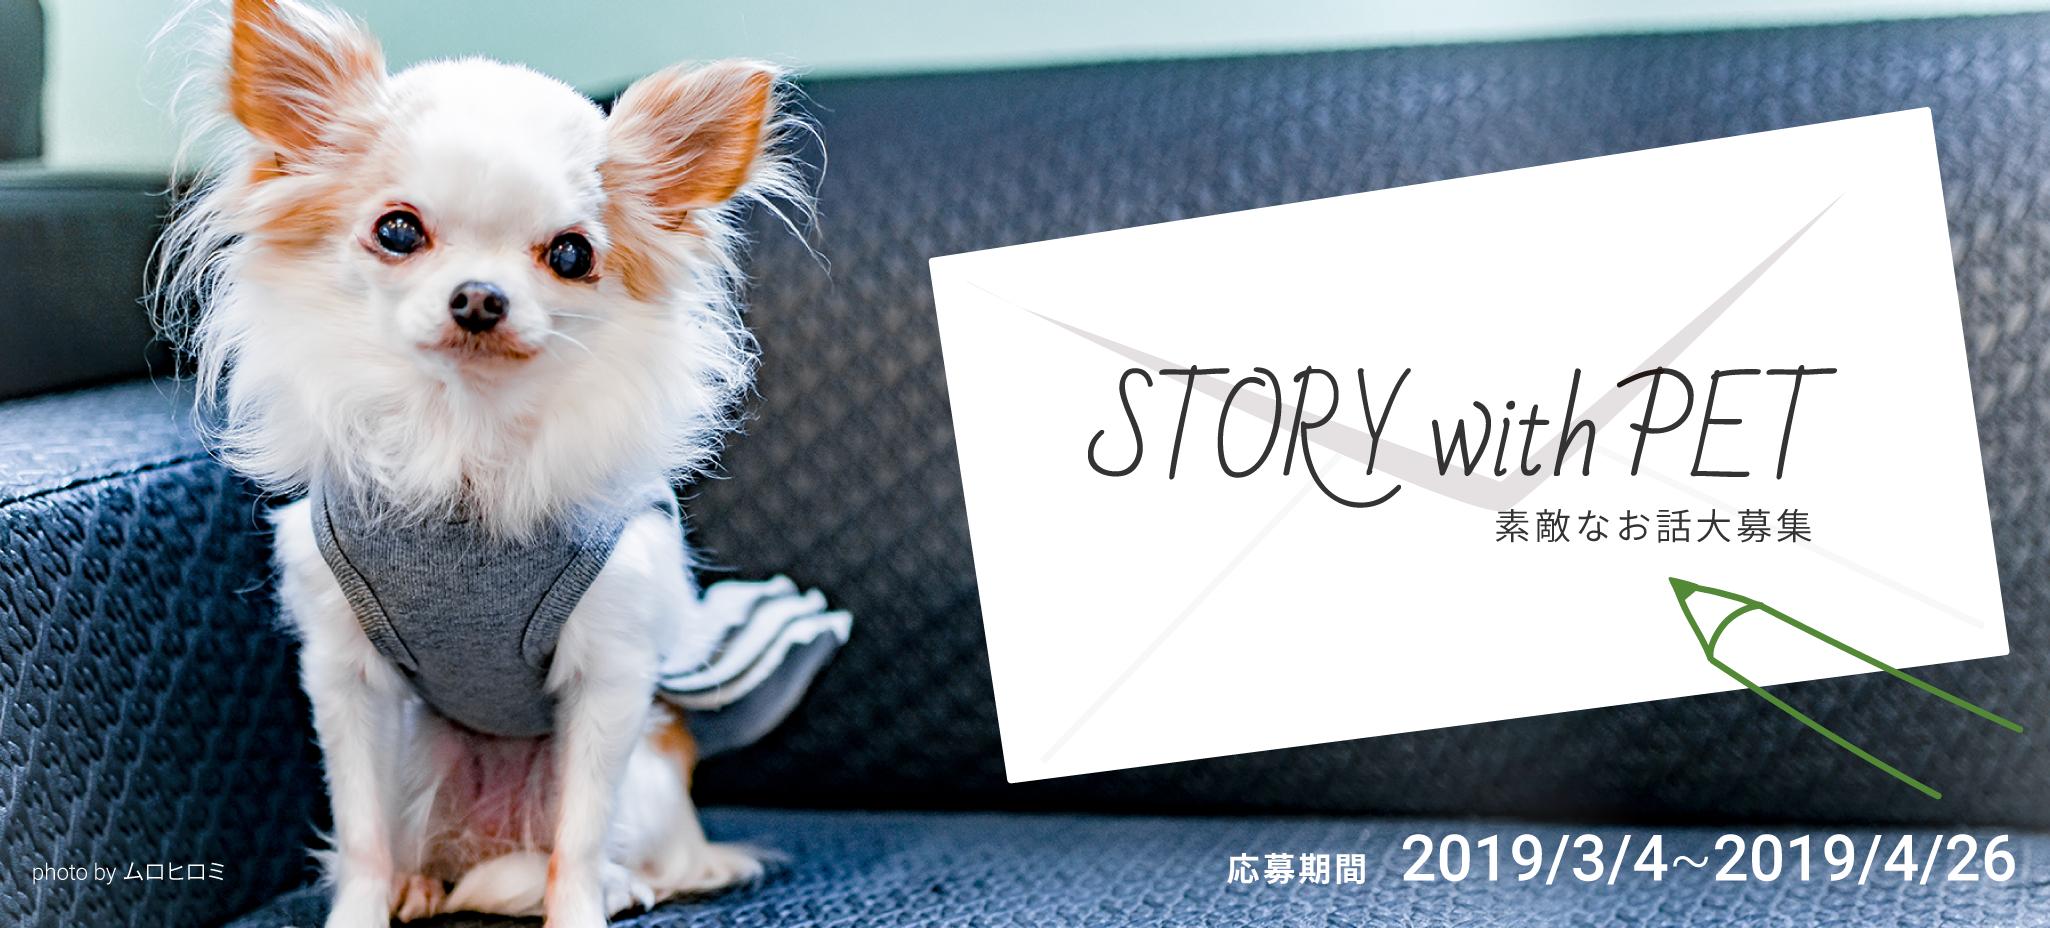 Story With Pet 公益社団法人アニマル ドネーション